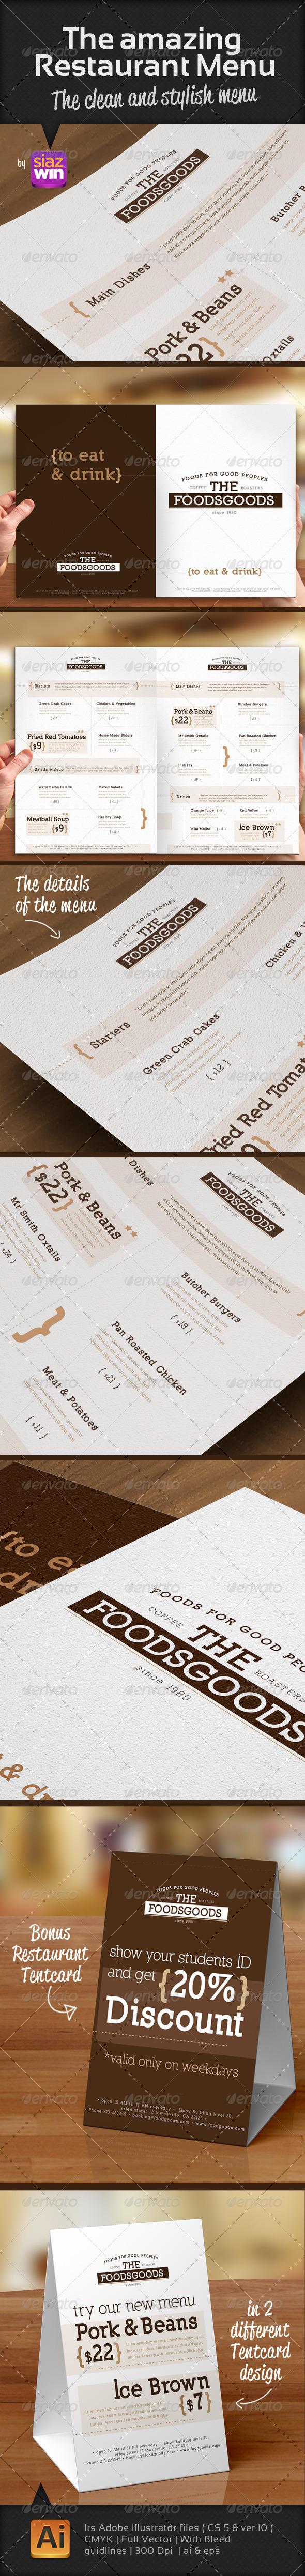 GraphicRiver The Amazing Restaurant Menu 1 3068663